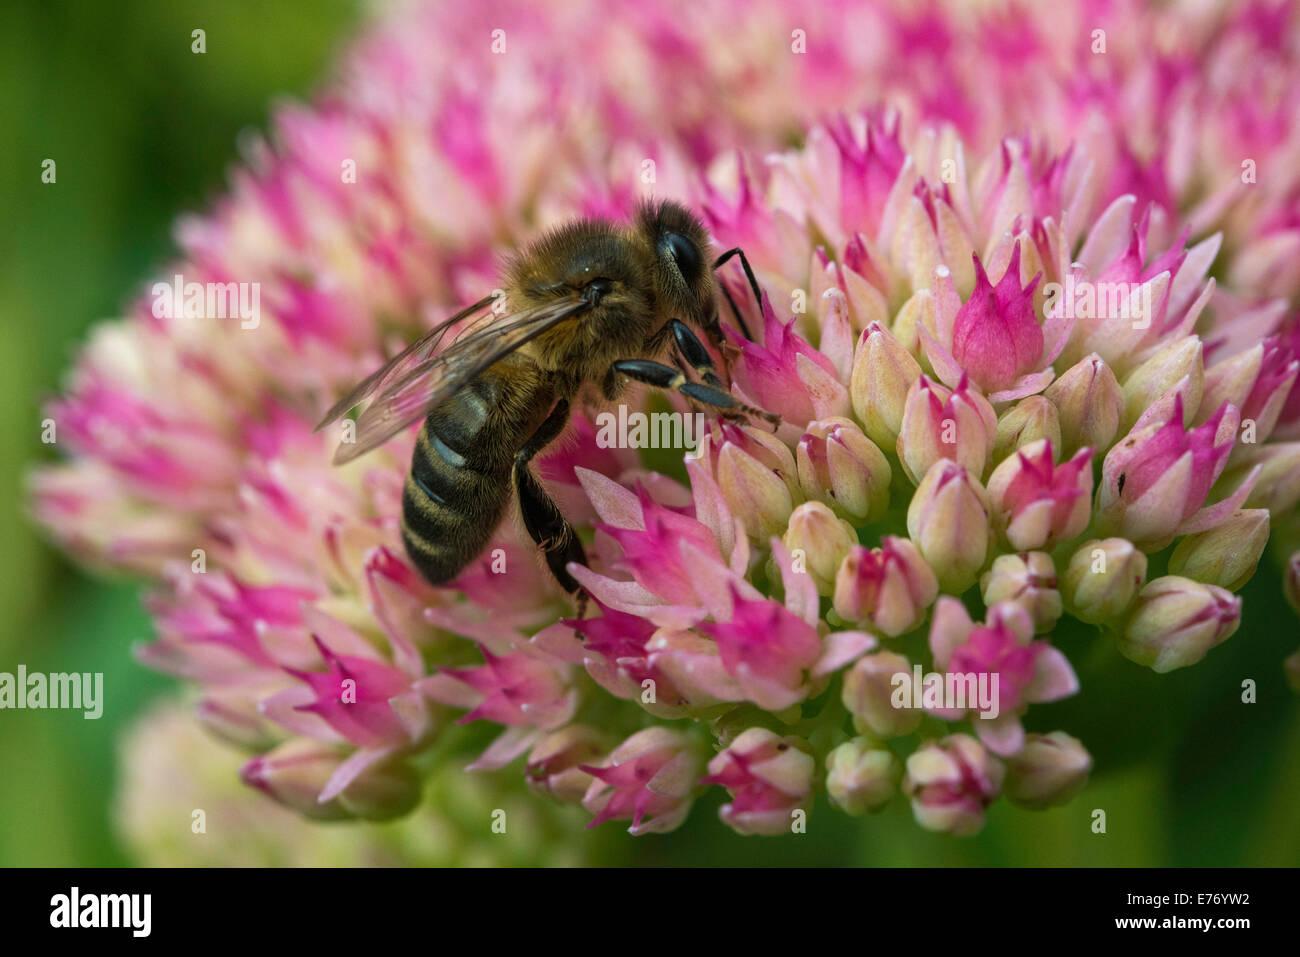 BEE ON SEDUM FLOWER HEAD IN DOMESTIC GARDEN GLOUCESTERSHIRE ENGLAND UK - Stock Image